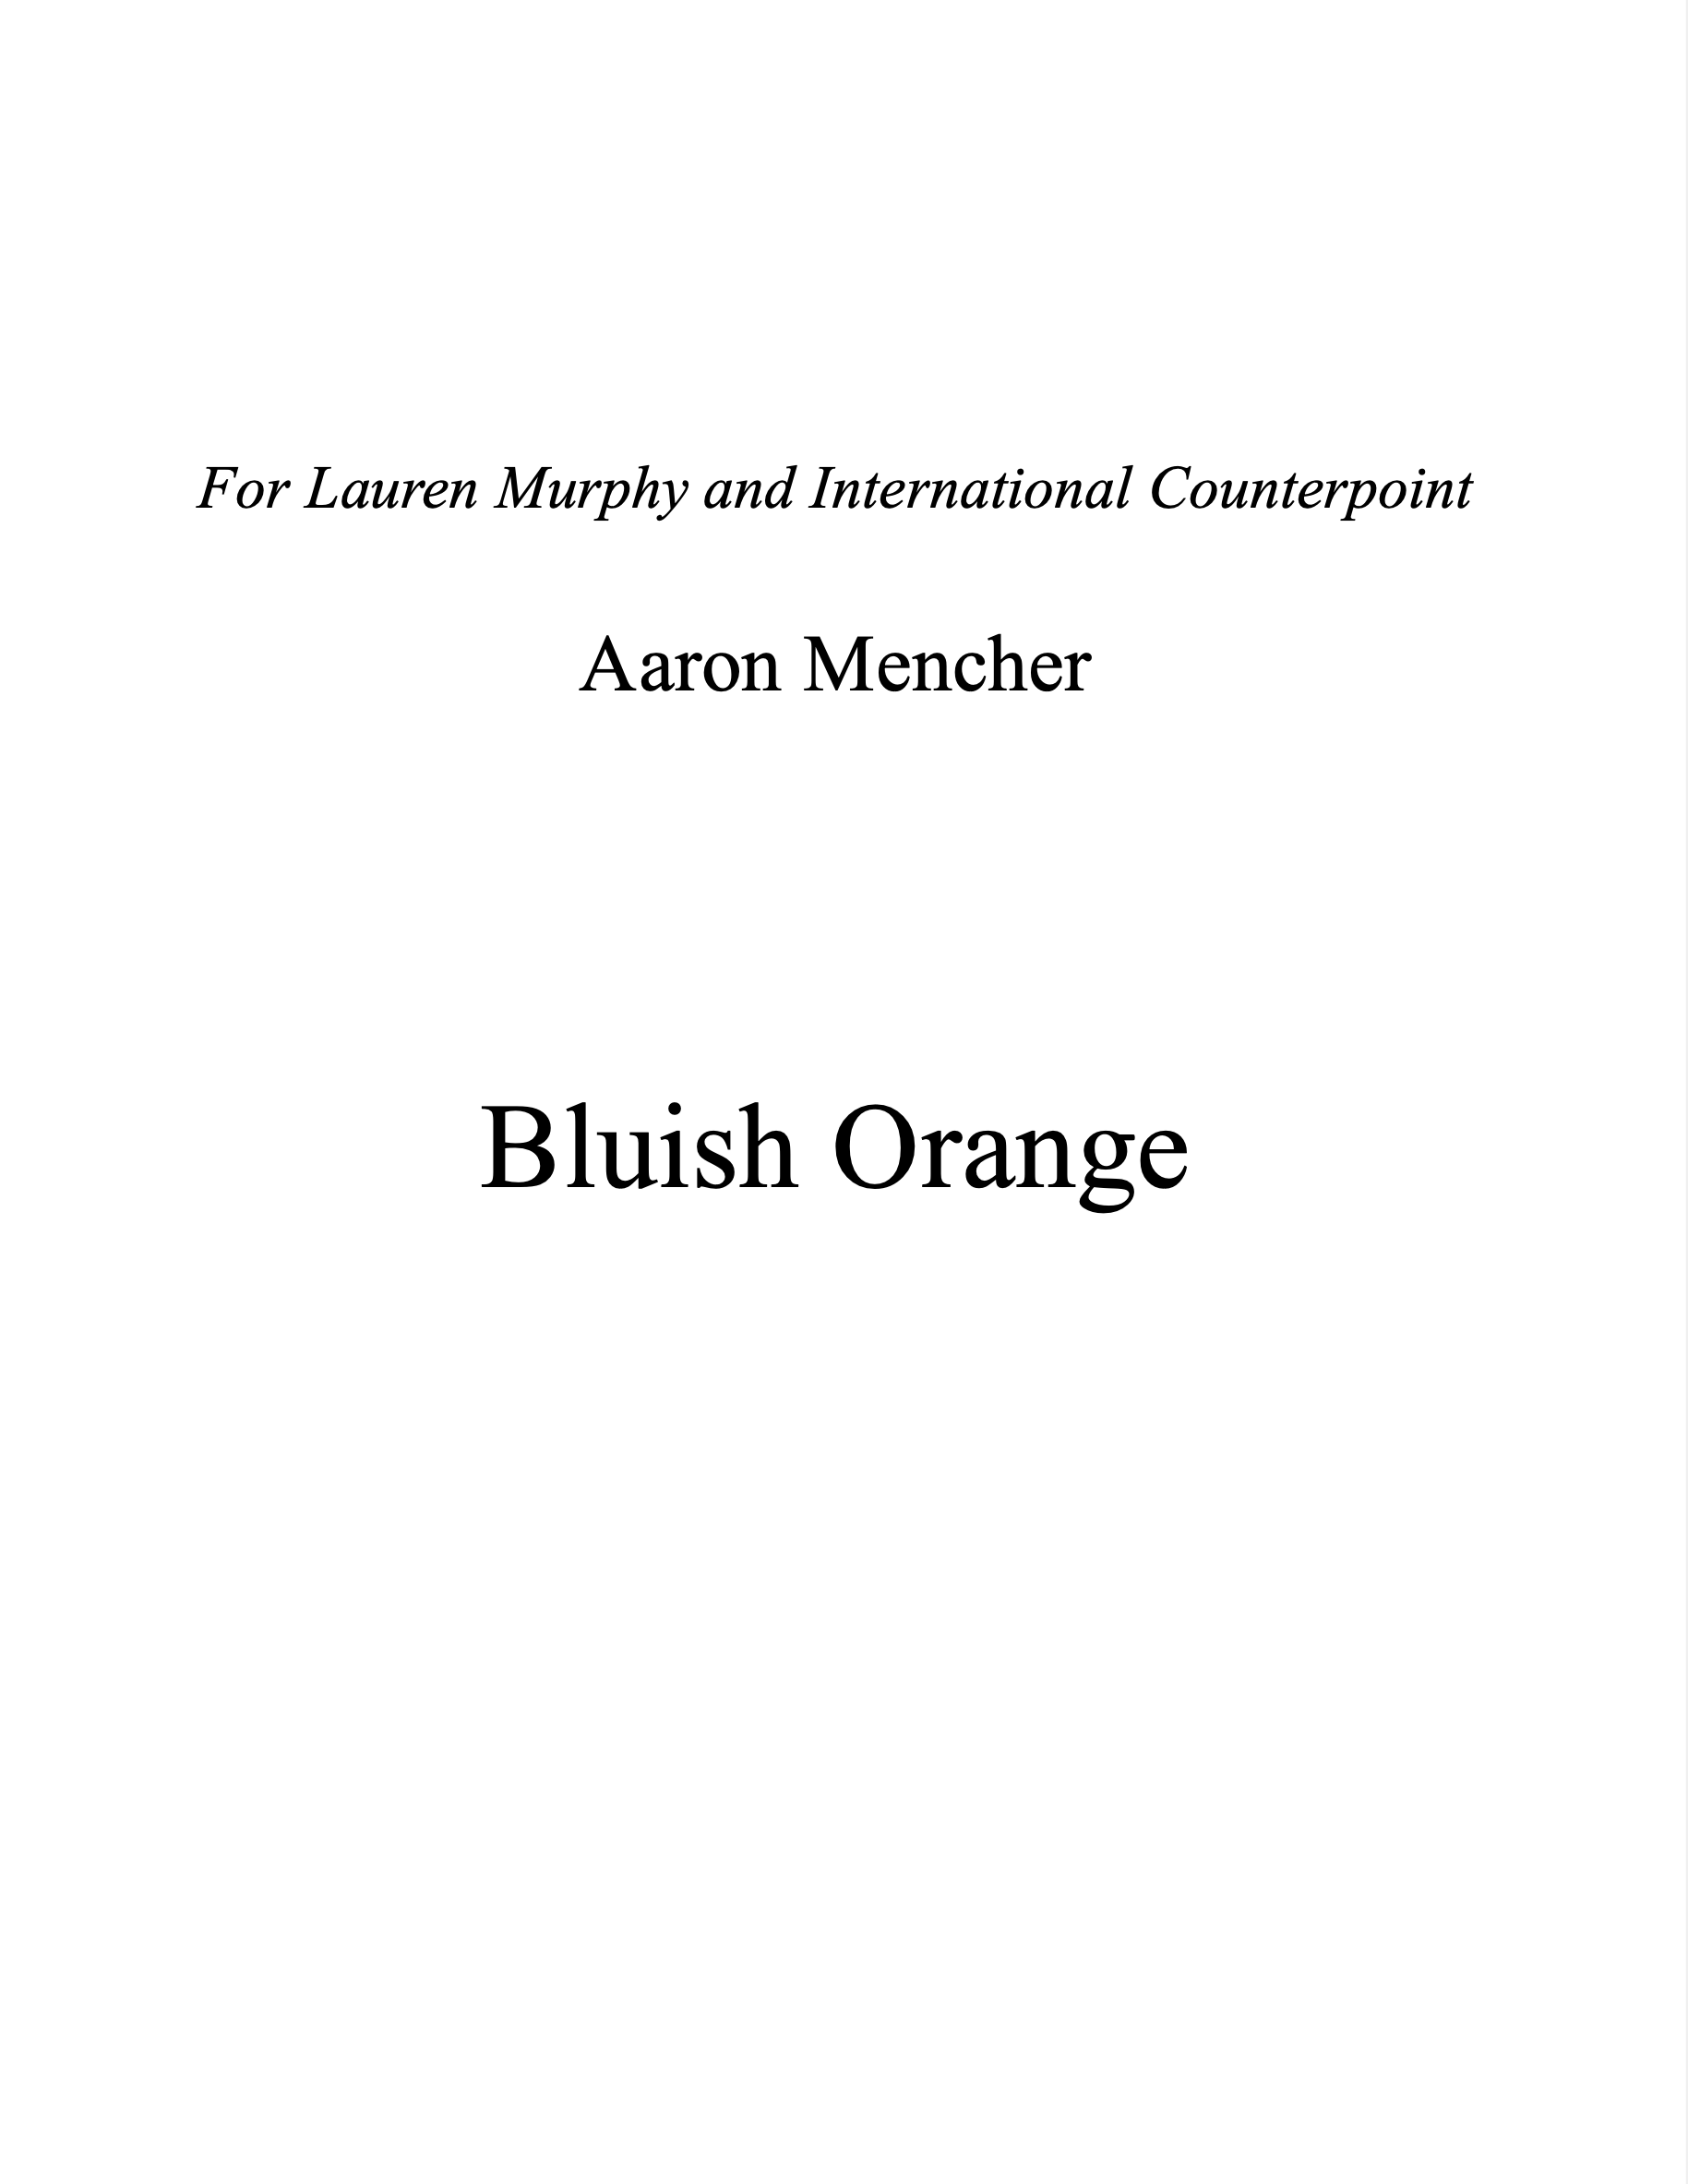 Bluish Orange by Aaron Mencher